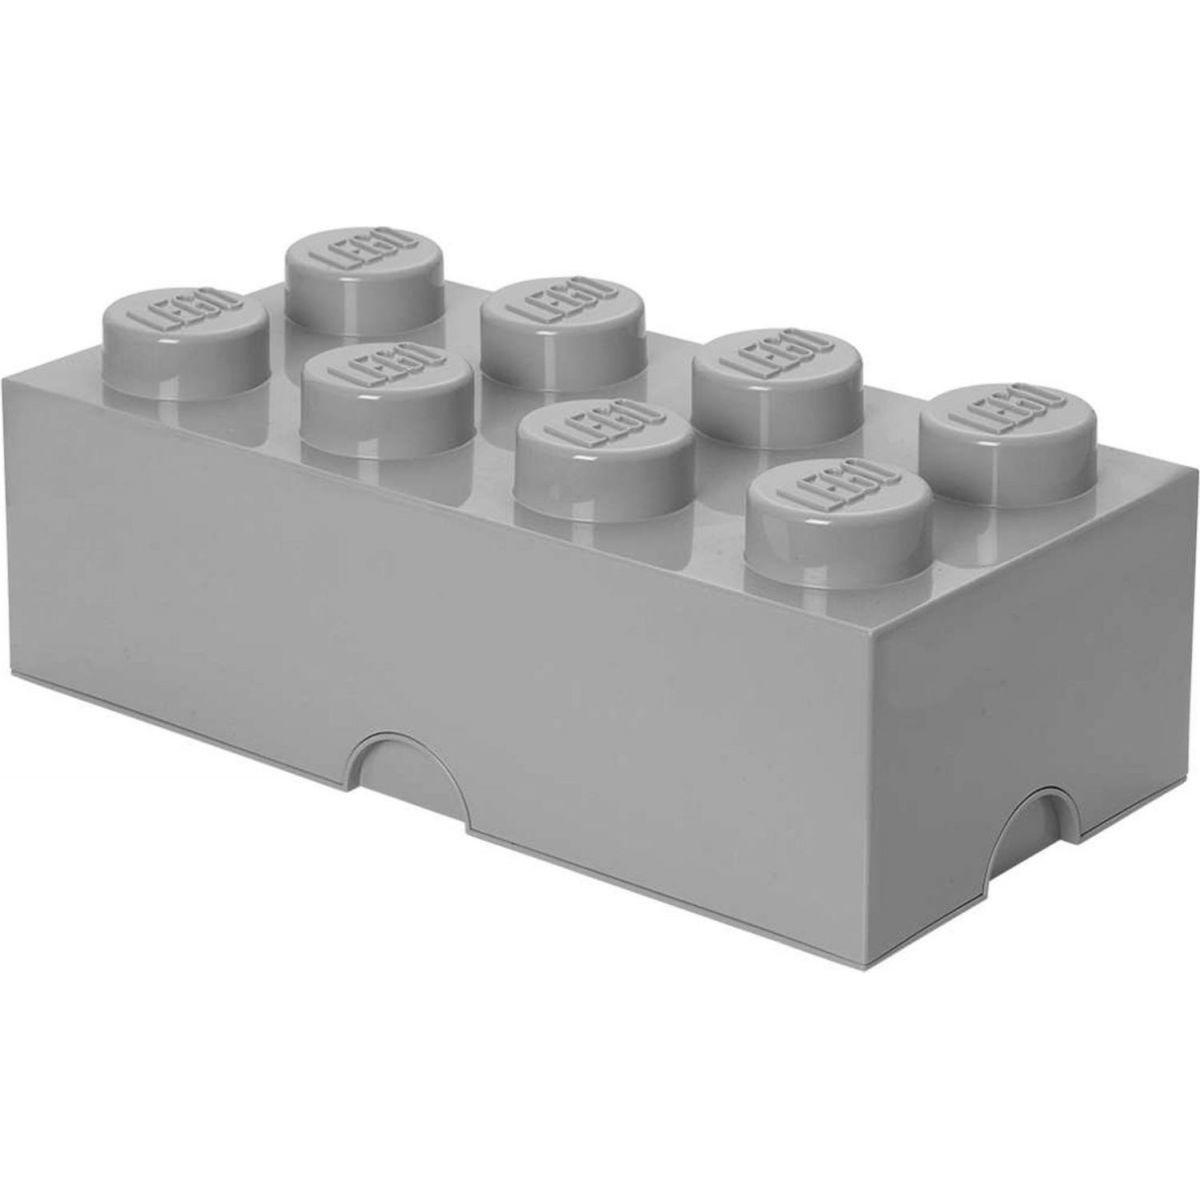 LEGO Úložný box 25 x 50 x 18 cm Šedá